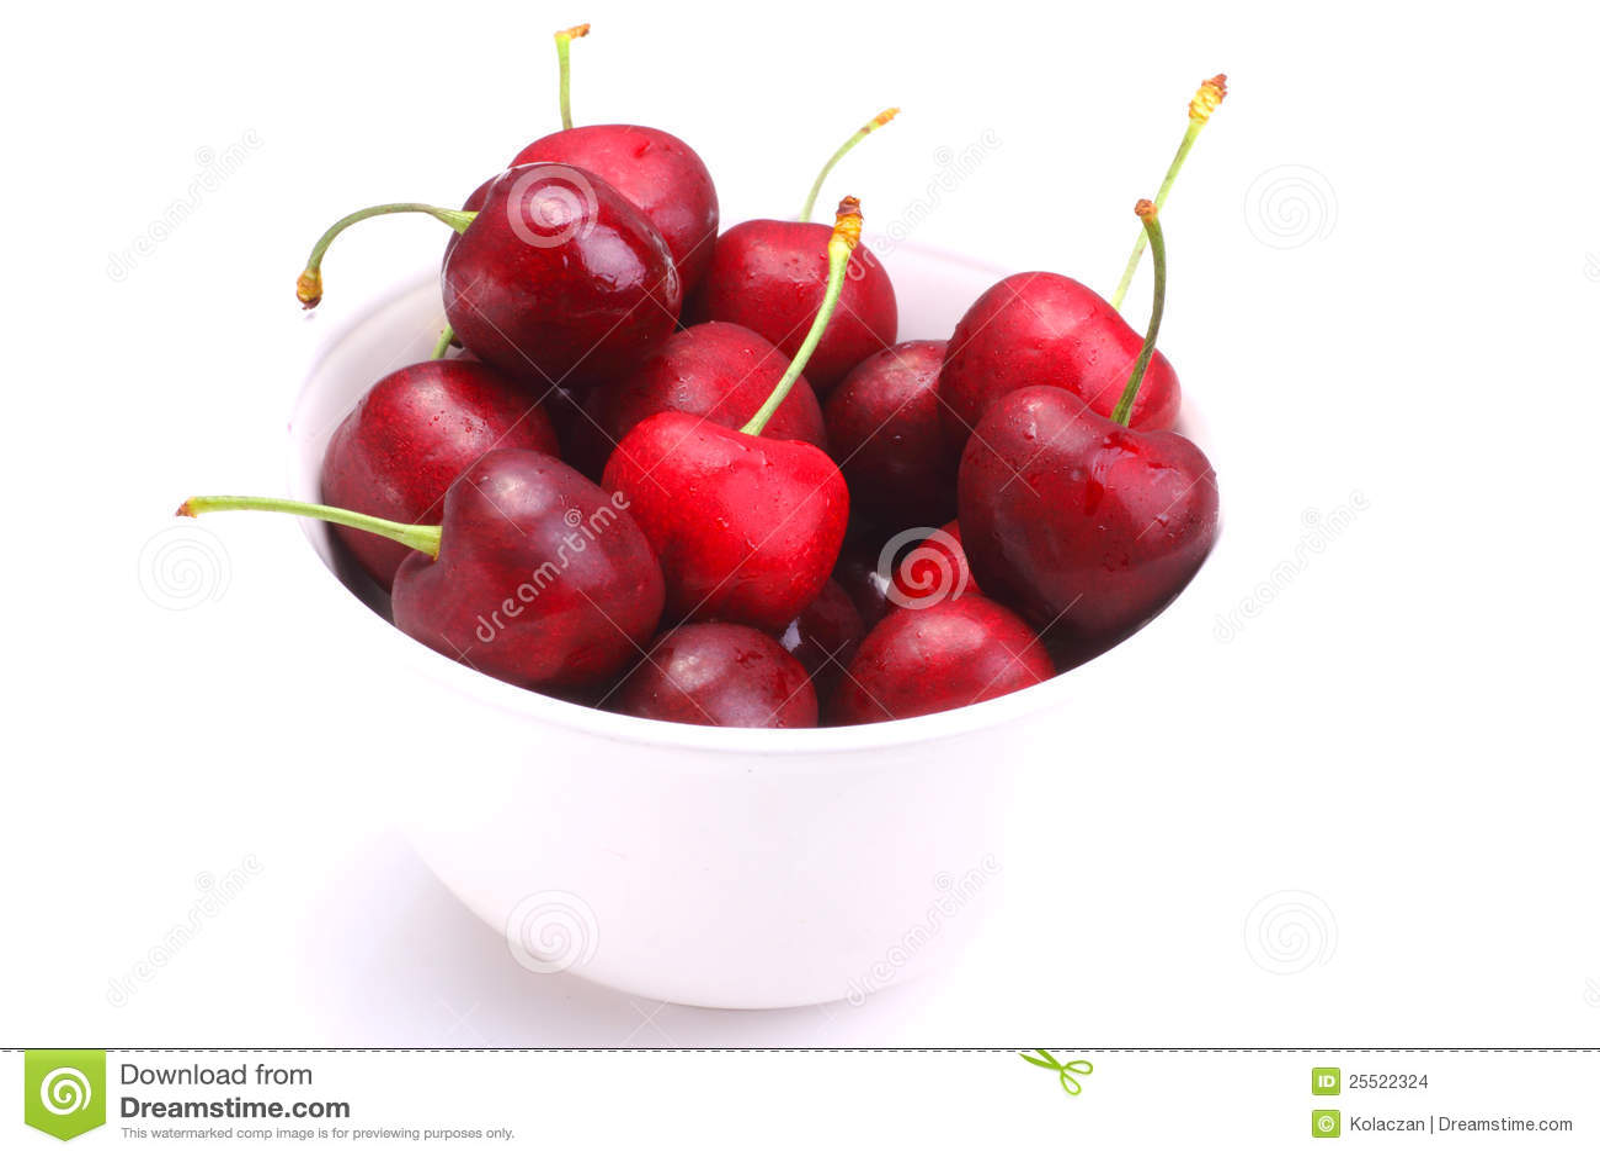 Fresh Cherries Stock Images - Image: 25522324